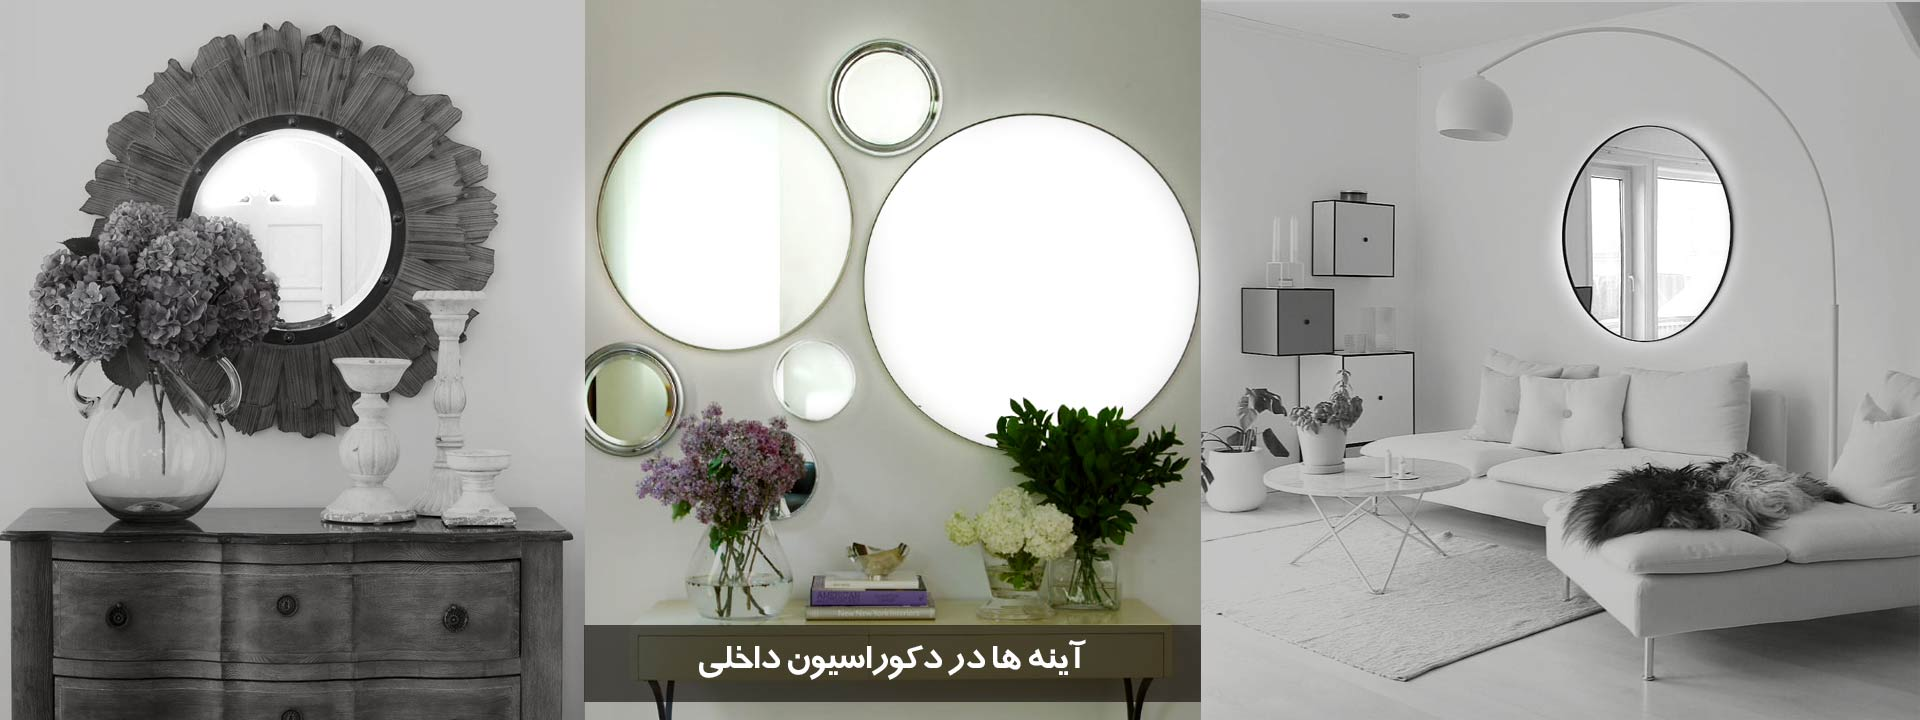 decorating mirrors 2 - آینه ها در دکوراسیون داخلی